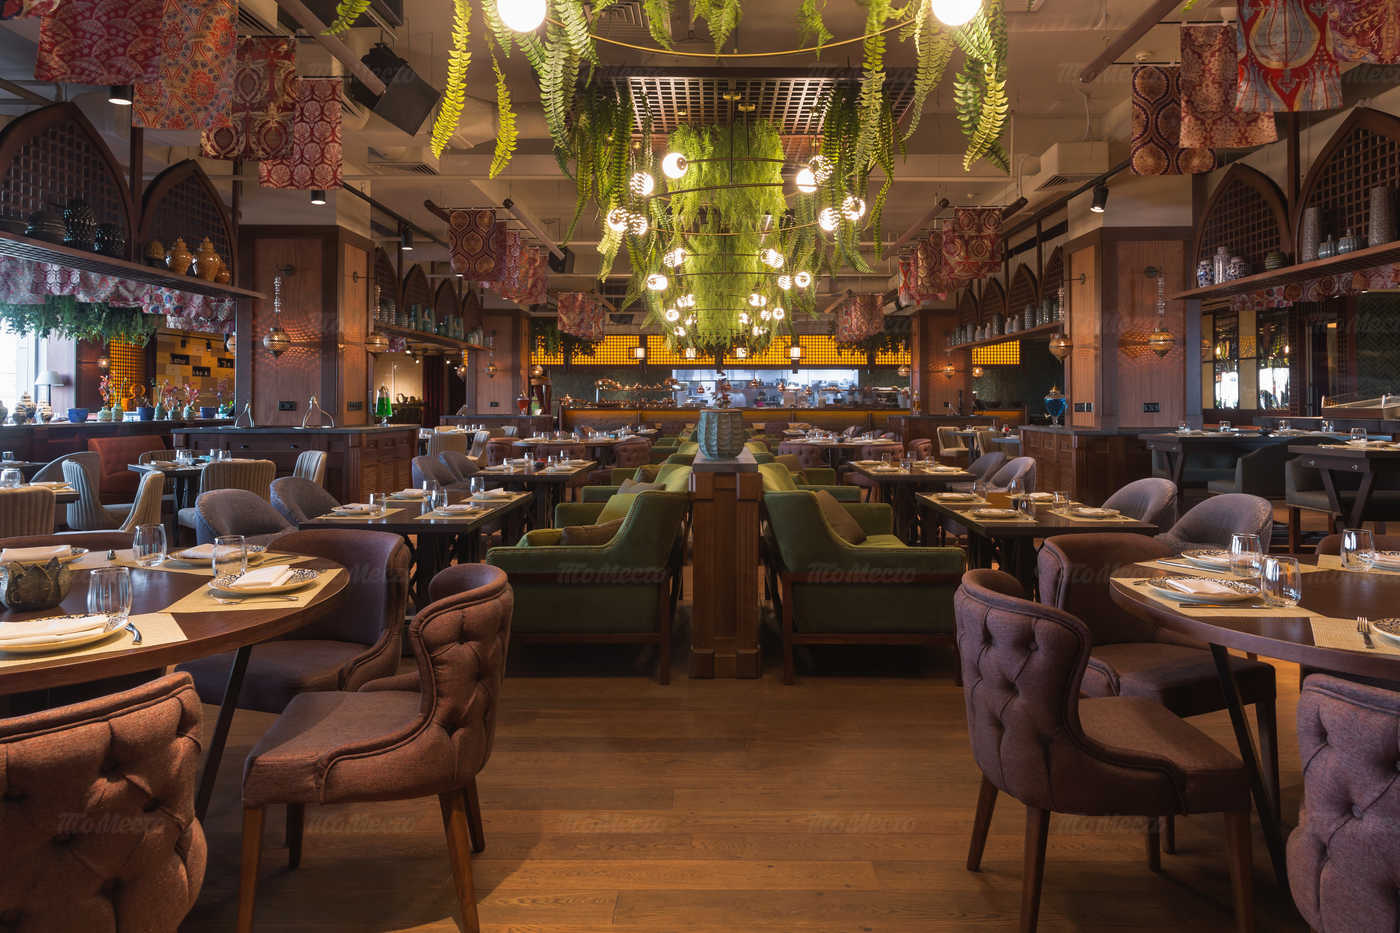 Ресторан Левантин (Levantine) на Новинском бульваре фото 5